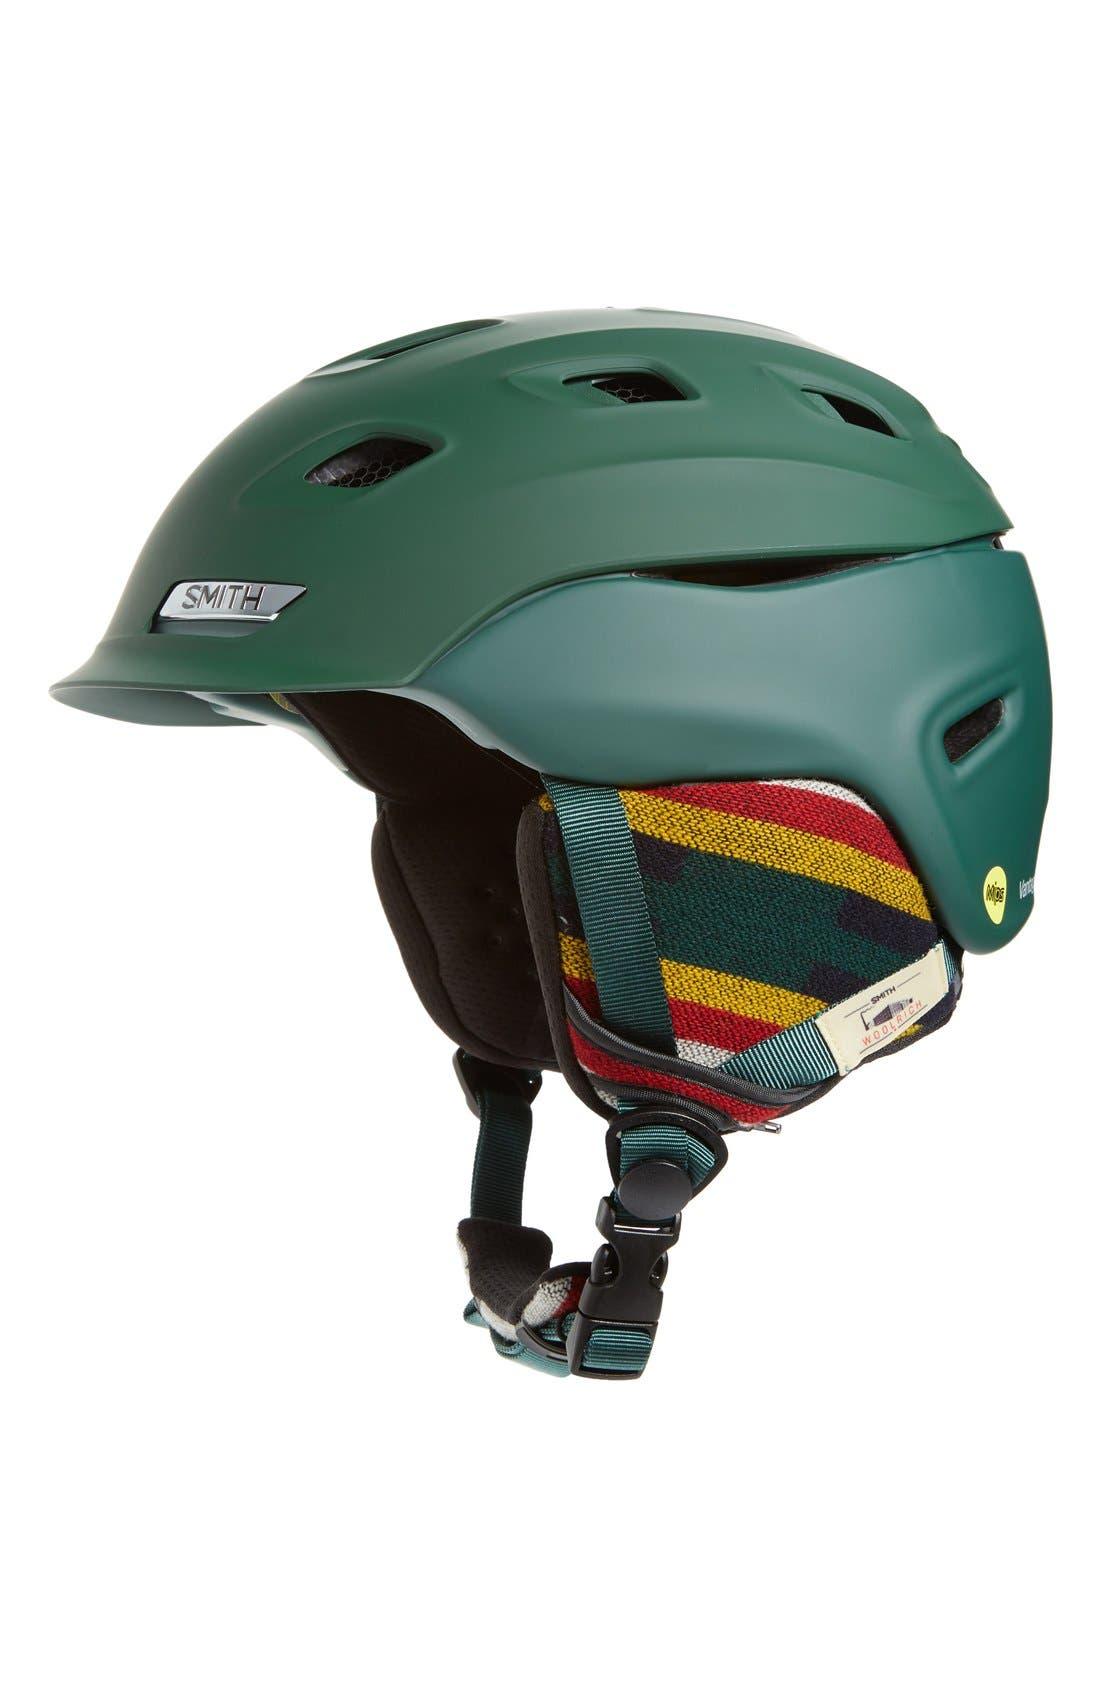 Main Image - Smith Vantage Snow Helmet with MIPS